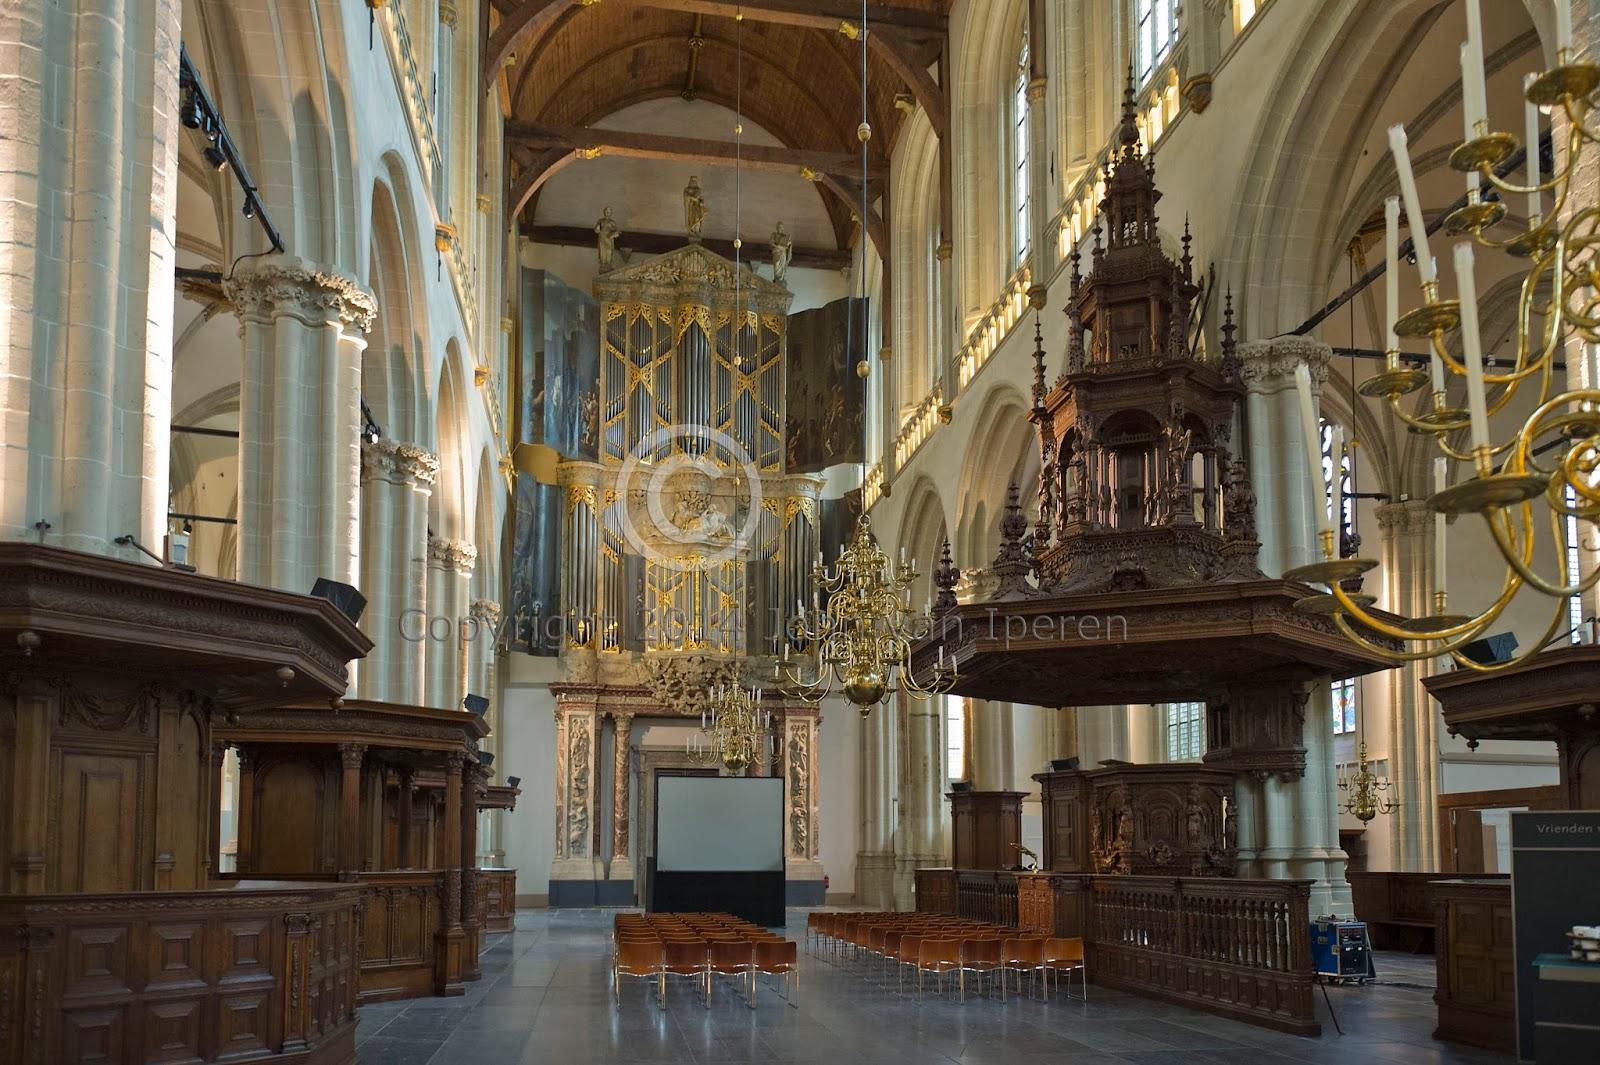 John van iperen foto jovip de nieuwe kerk amsterdam for Interieur amsterdam